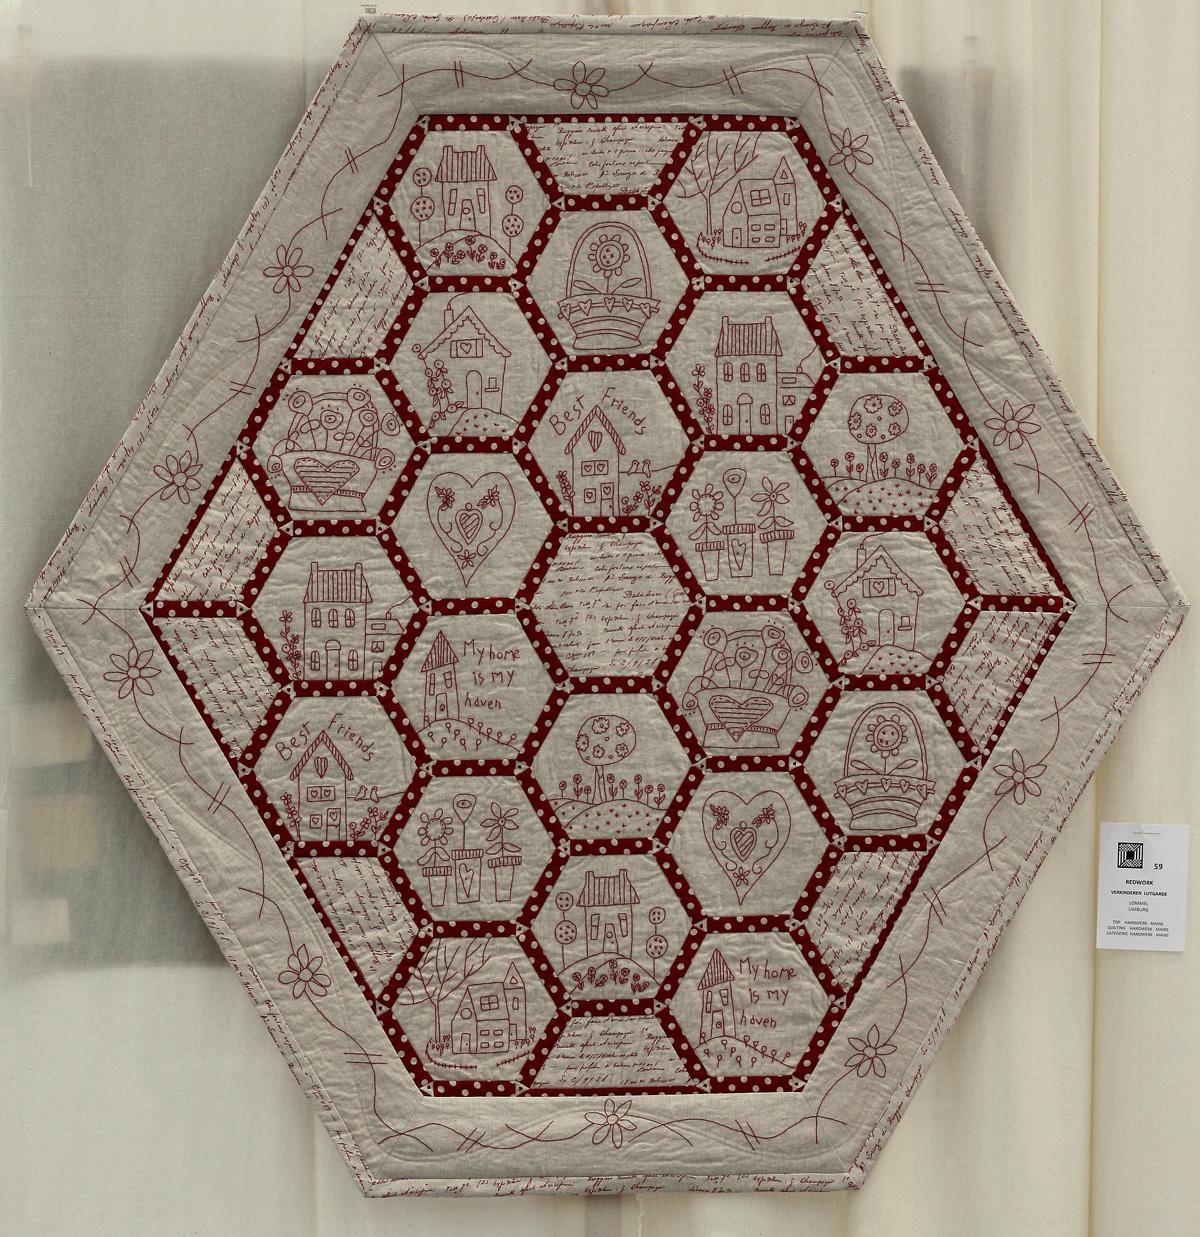 20    n°  59    72    Lutgarde Verkinderen, Limburg, Redwork, 135 cm x 135 cm